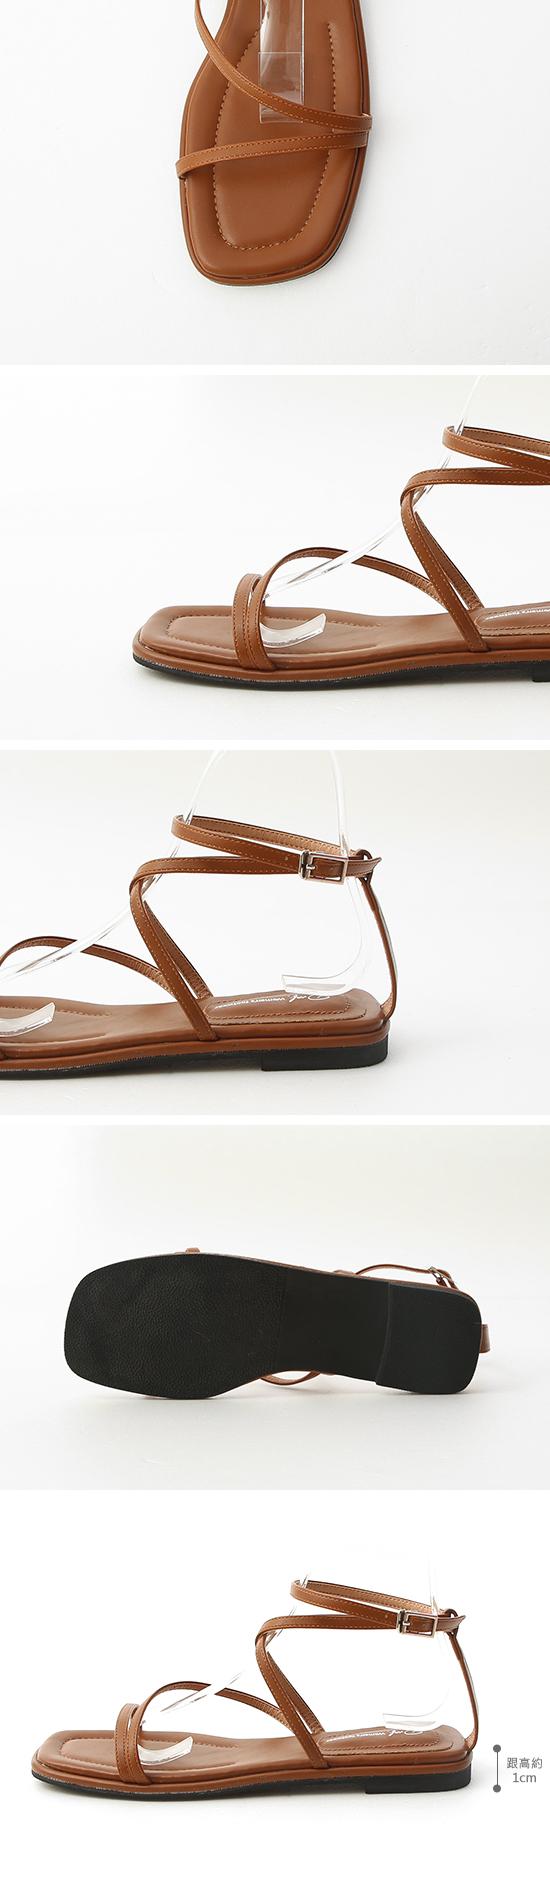 Square Toe Greek Sandals Brown